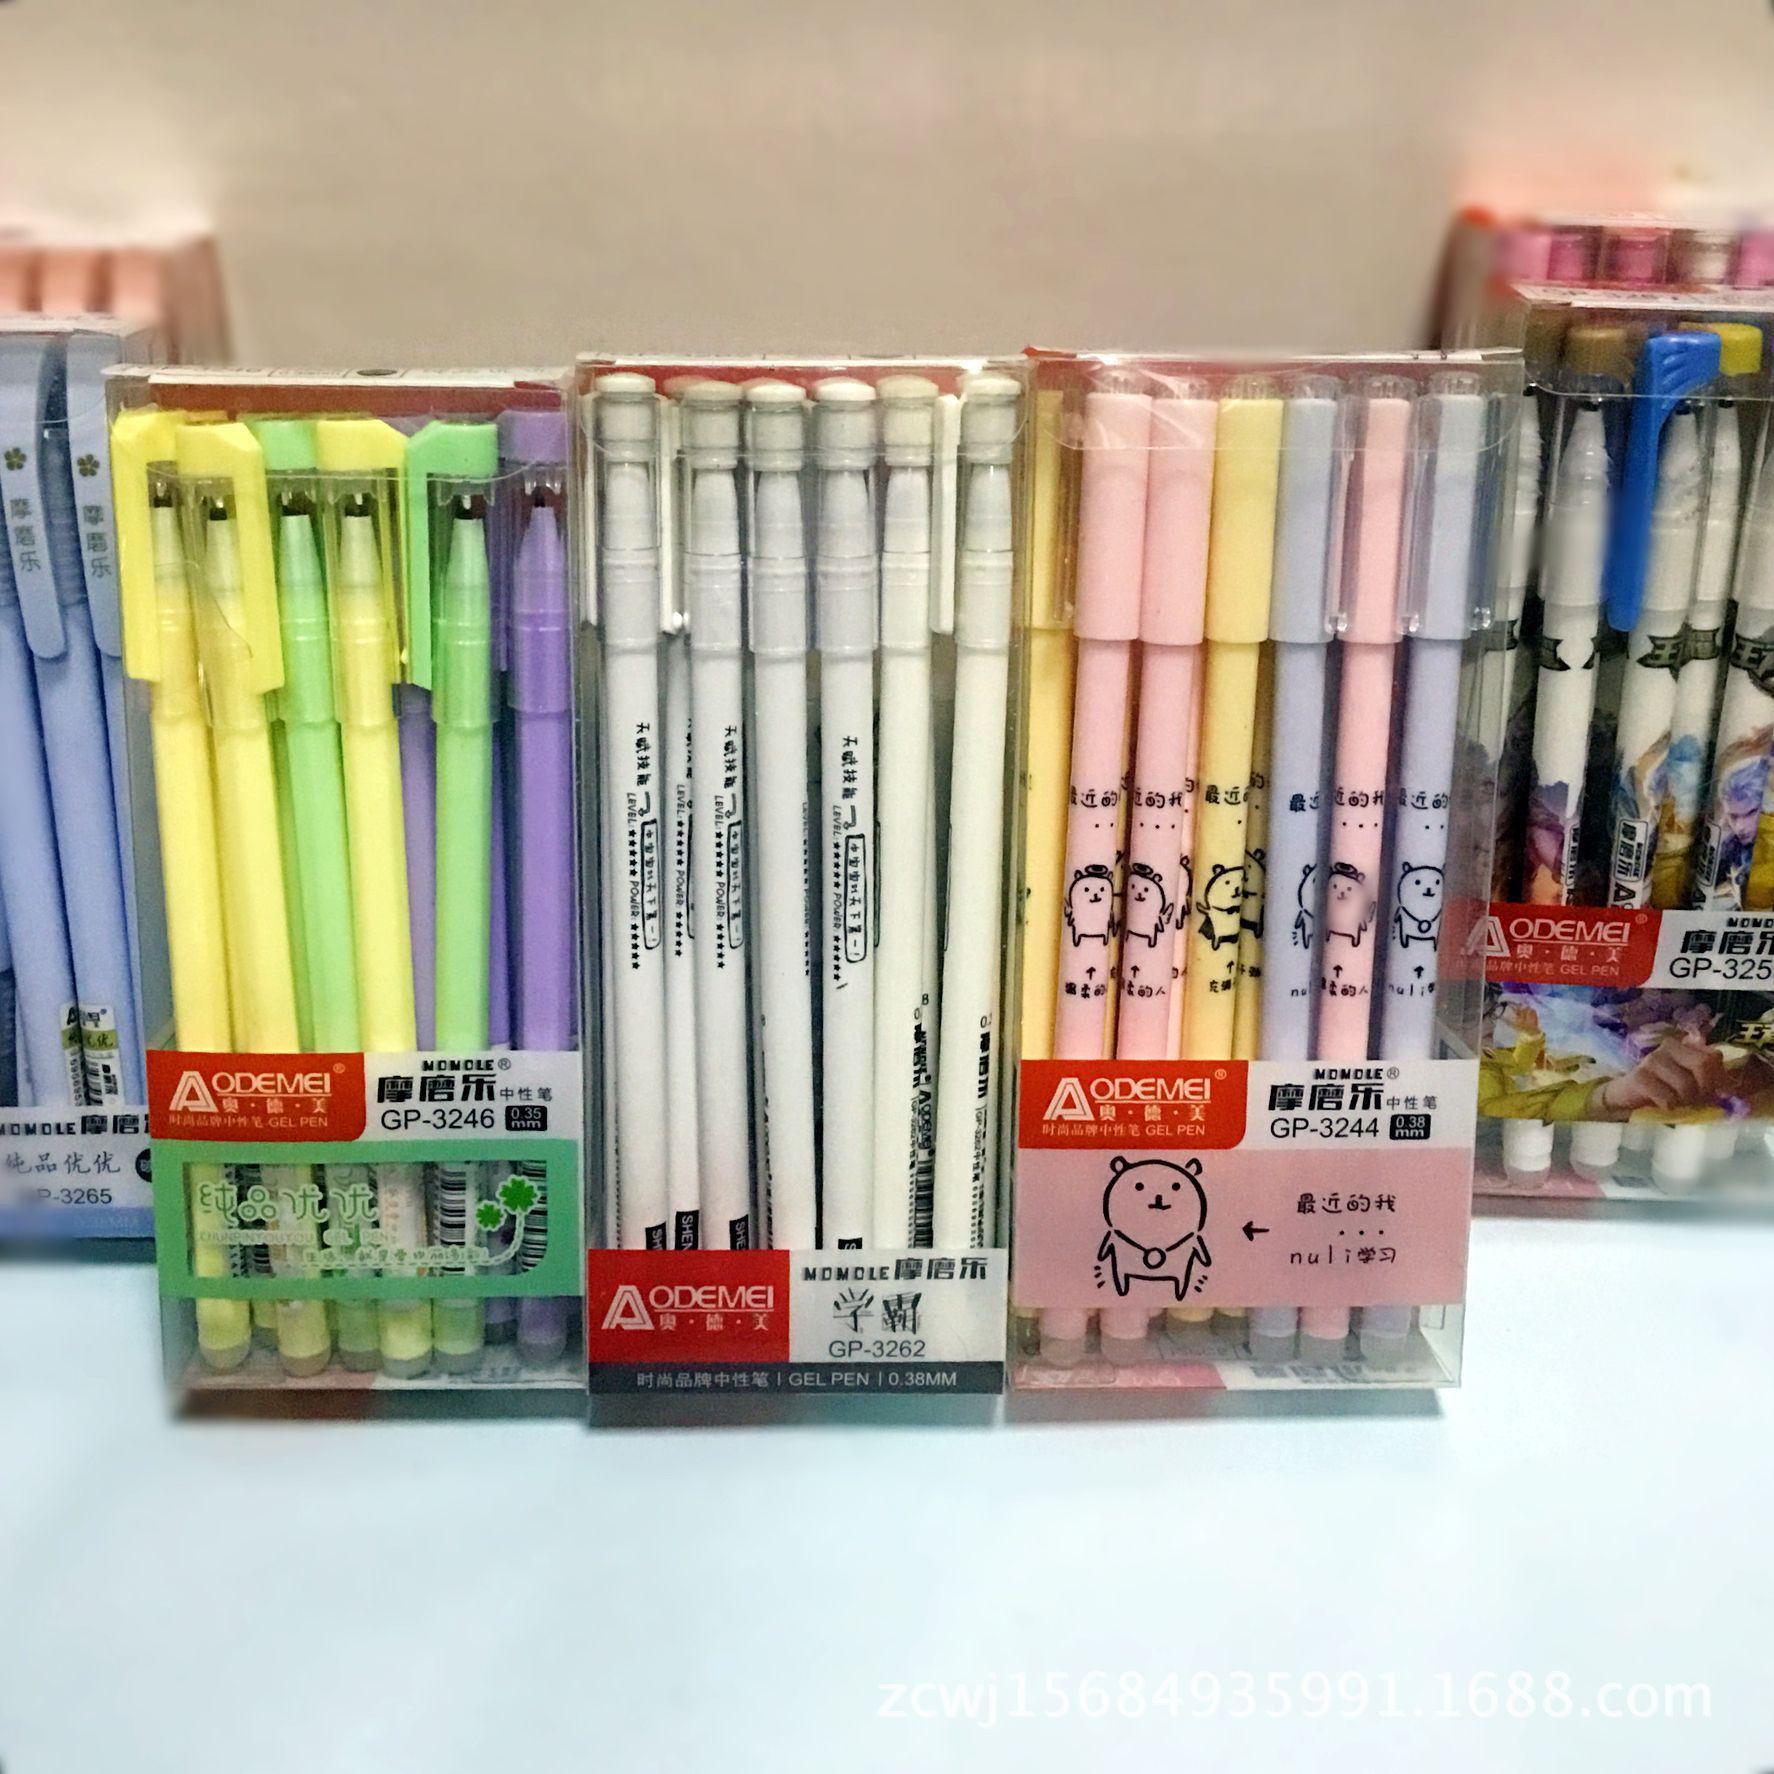 Combo 12 cây bút gel tẩy xóa được (mẫu ngẫu nhiên)